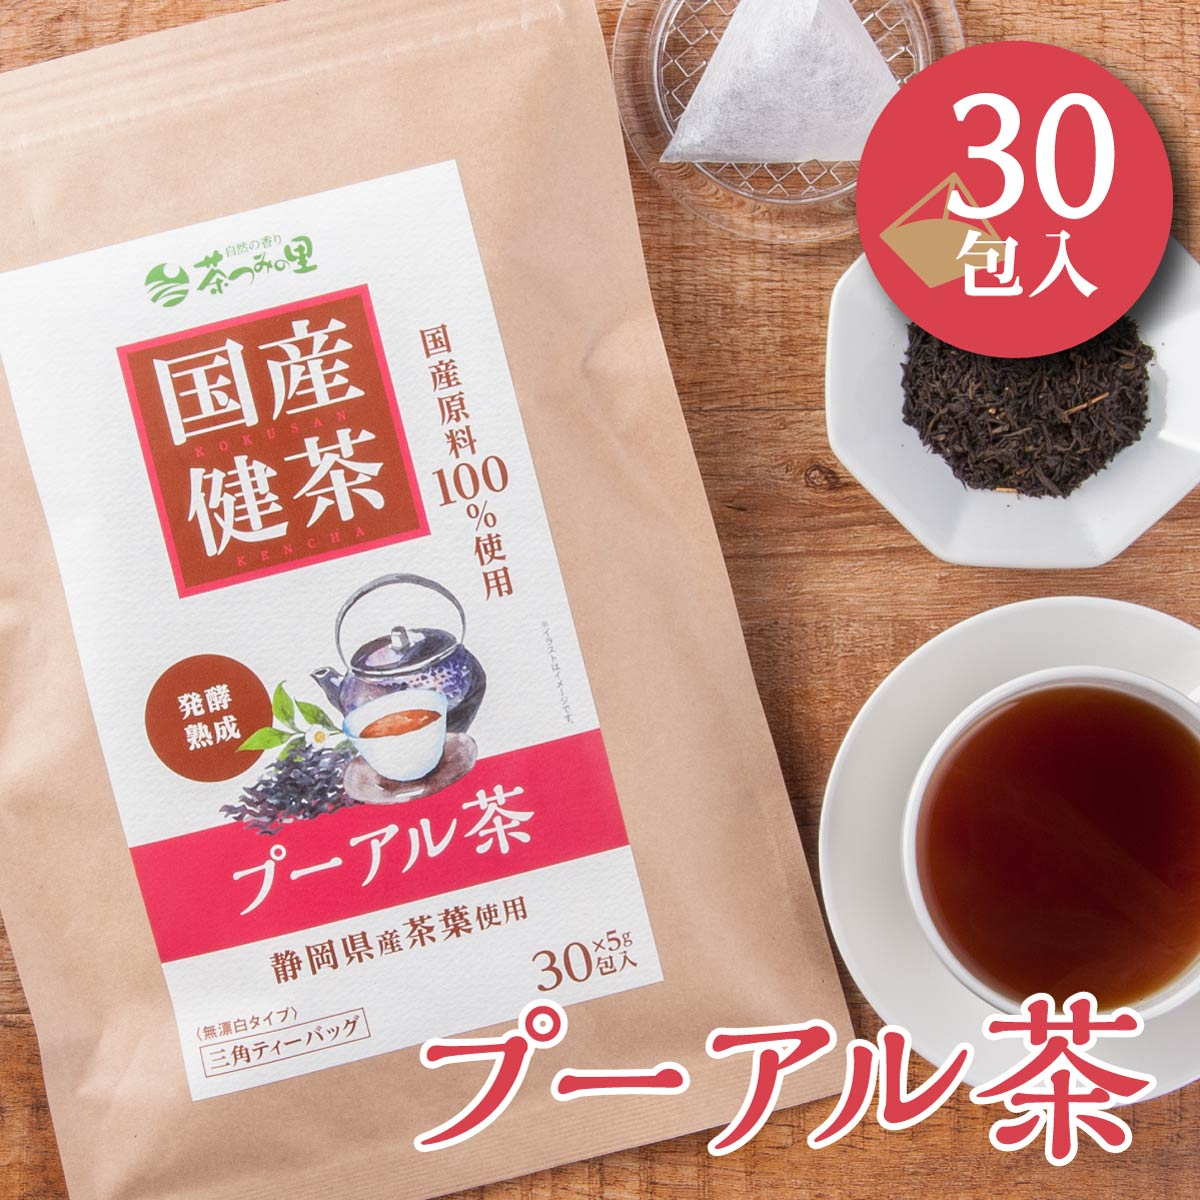 NEW売り切れる前に☆ 100%静岡産原料 すべて国内製造で安心 ポストへお届け 新発売 国産 プーアル茶 健康茶 プーアル ティーパック 送料無料 メーカー直送 ティーバッグ 5g×30包入